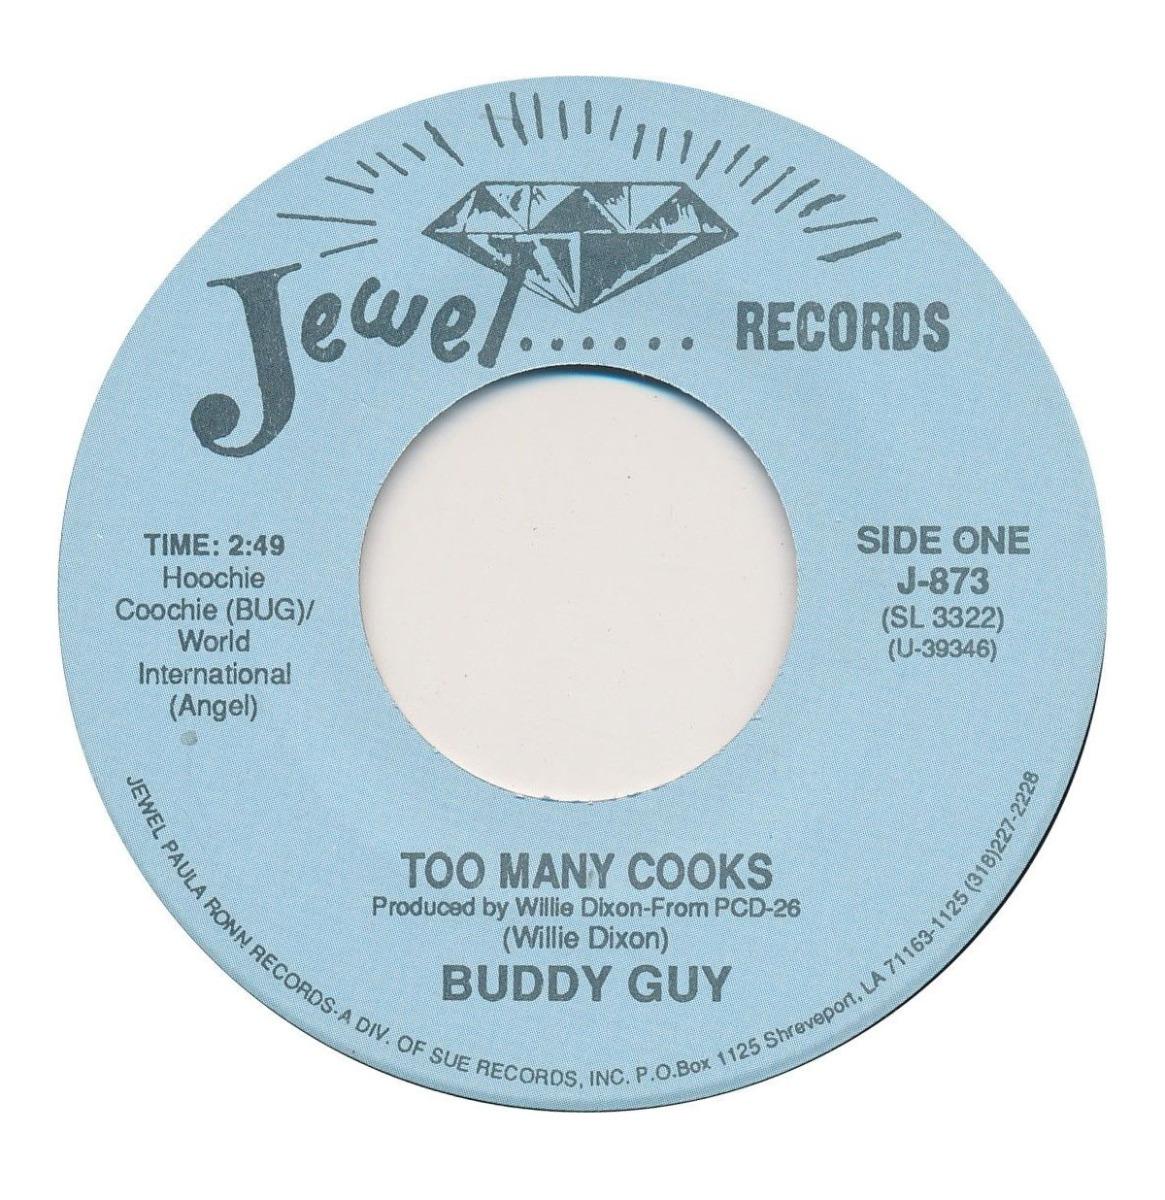 Buddy Guy - Too Many Cooks / Heavy Heart Beat (Jesse Fortune) Single